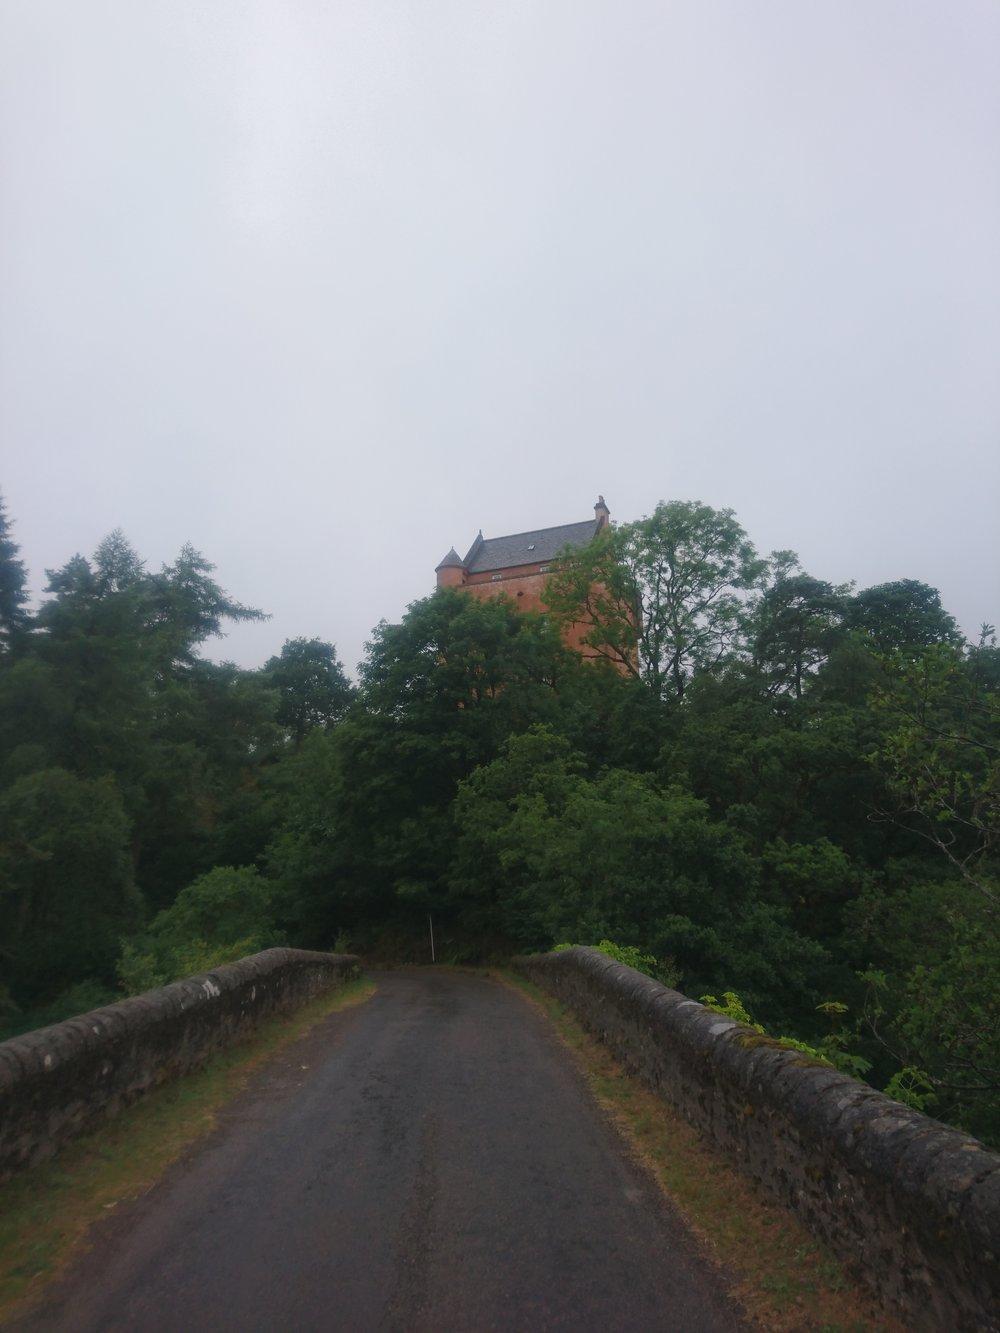 Kiclochaline Castle